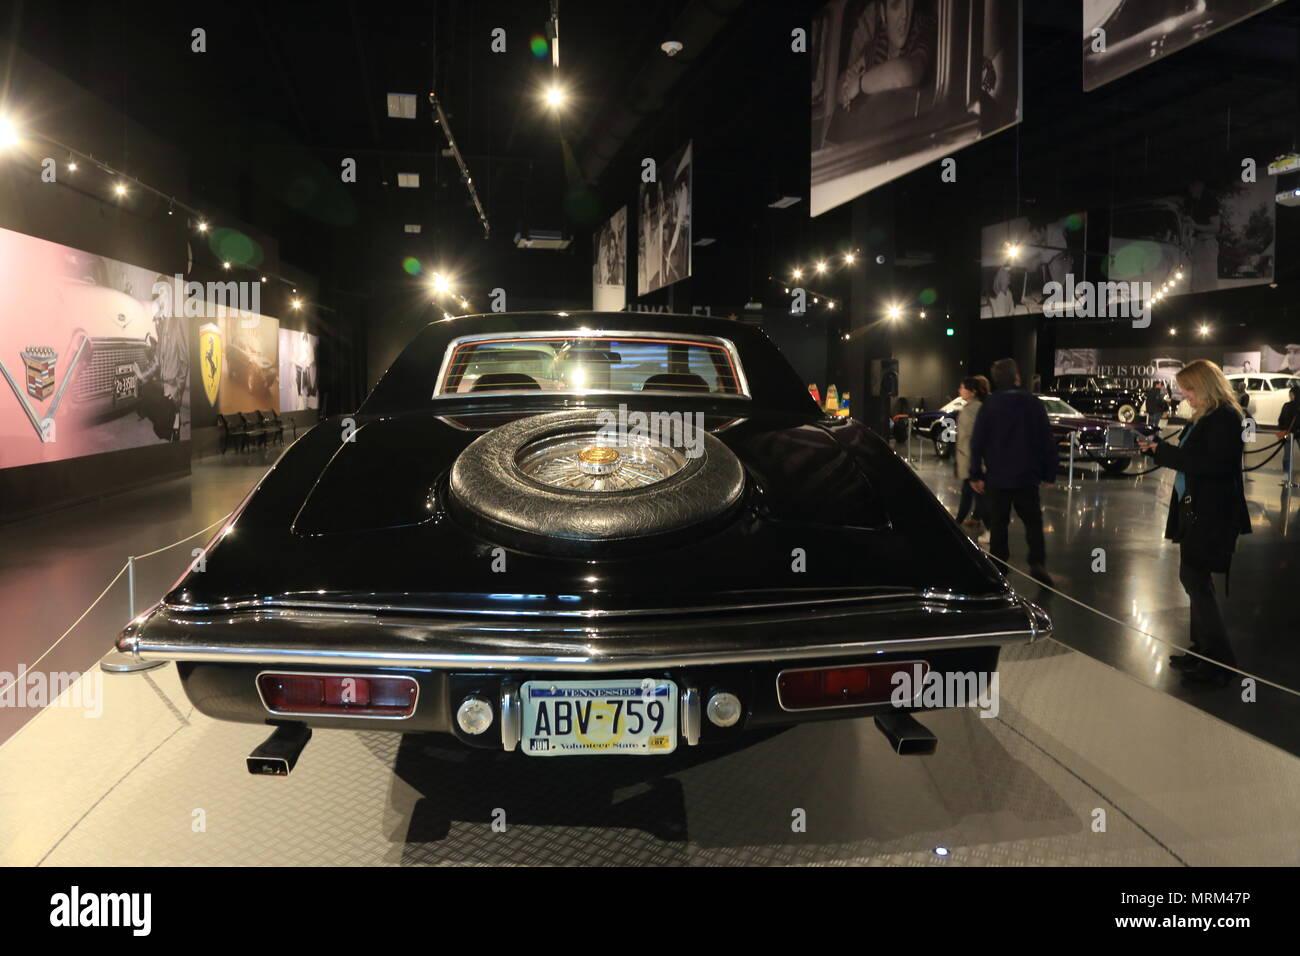 Elvis Presley's Stutz Blackhawk display in Presley Motors Automobile Museum in Graceland the home of Elvis Presley.Memphis,Tennessee.USA - Stock Image